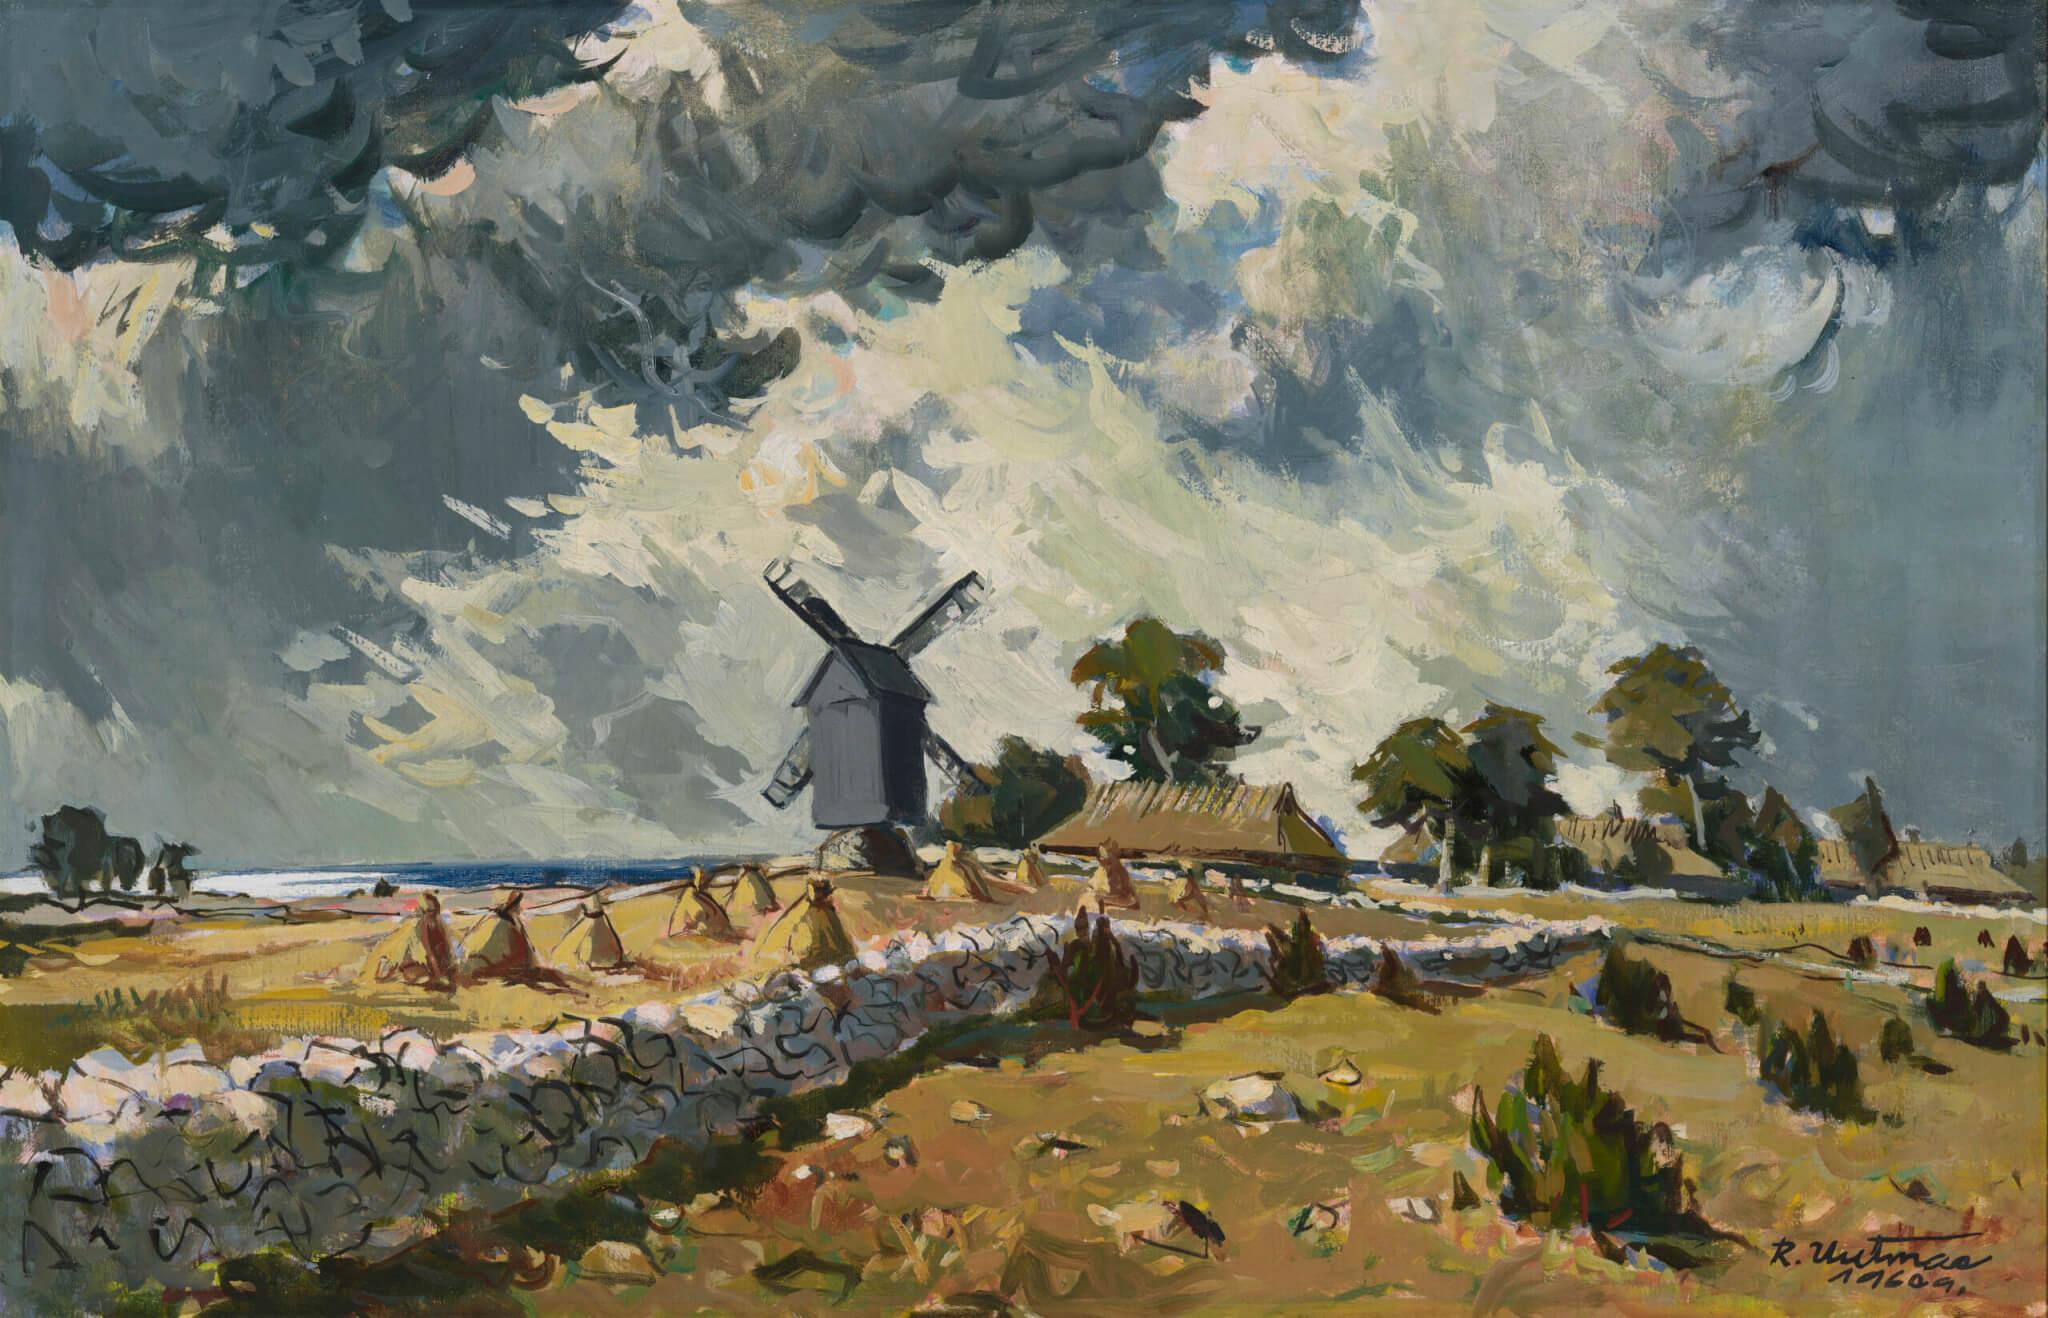 Richard-Uutmaa-näitus-Allee-kunstigalerii-Tallinn